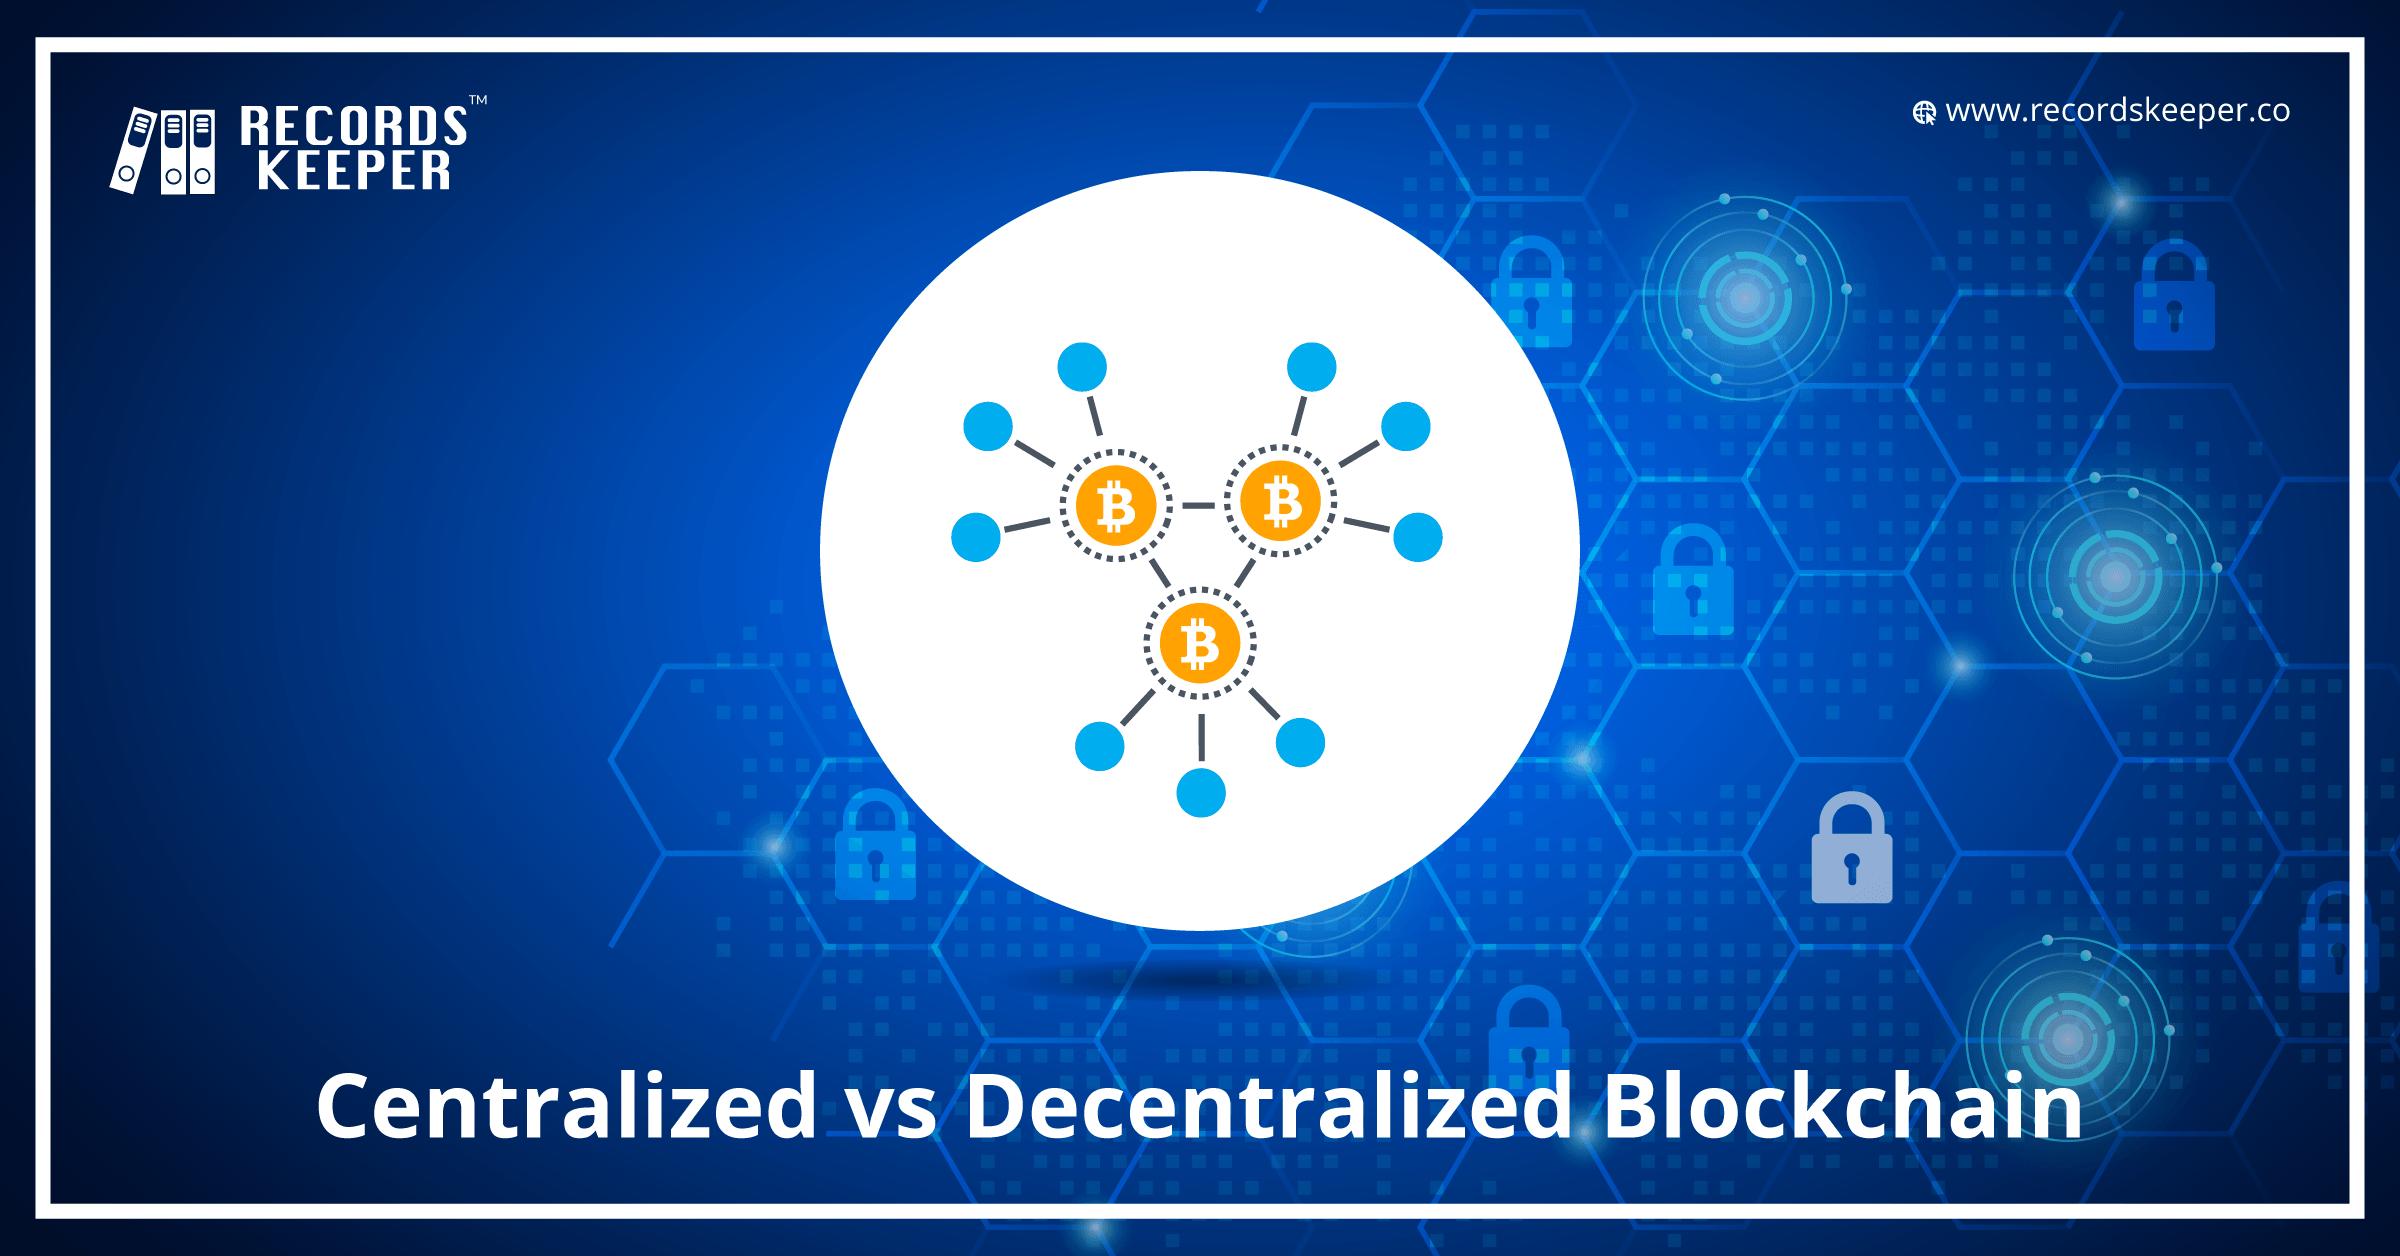 Centralized Vs Decentralized Blockchain Blockchain What Is Blockchain Blockchain Technology Decentral Blockchain Blockchain Wallet Blockchain Technology